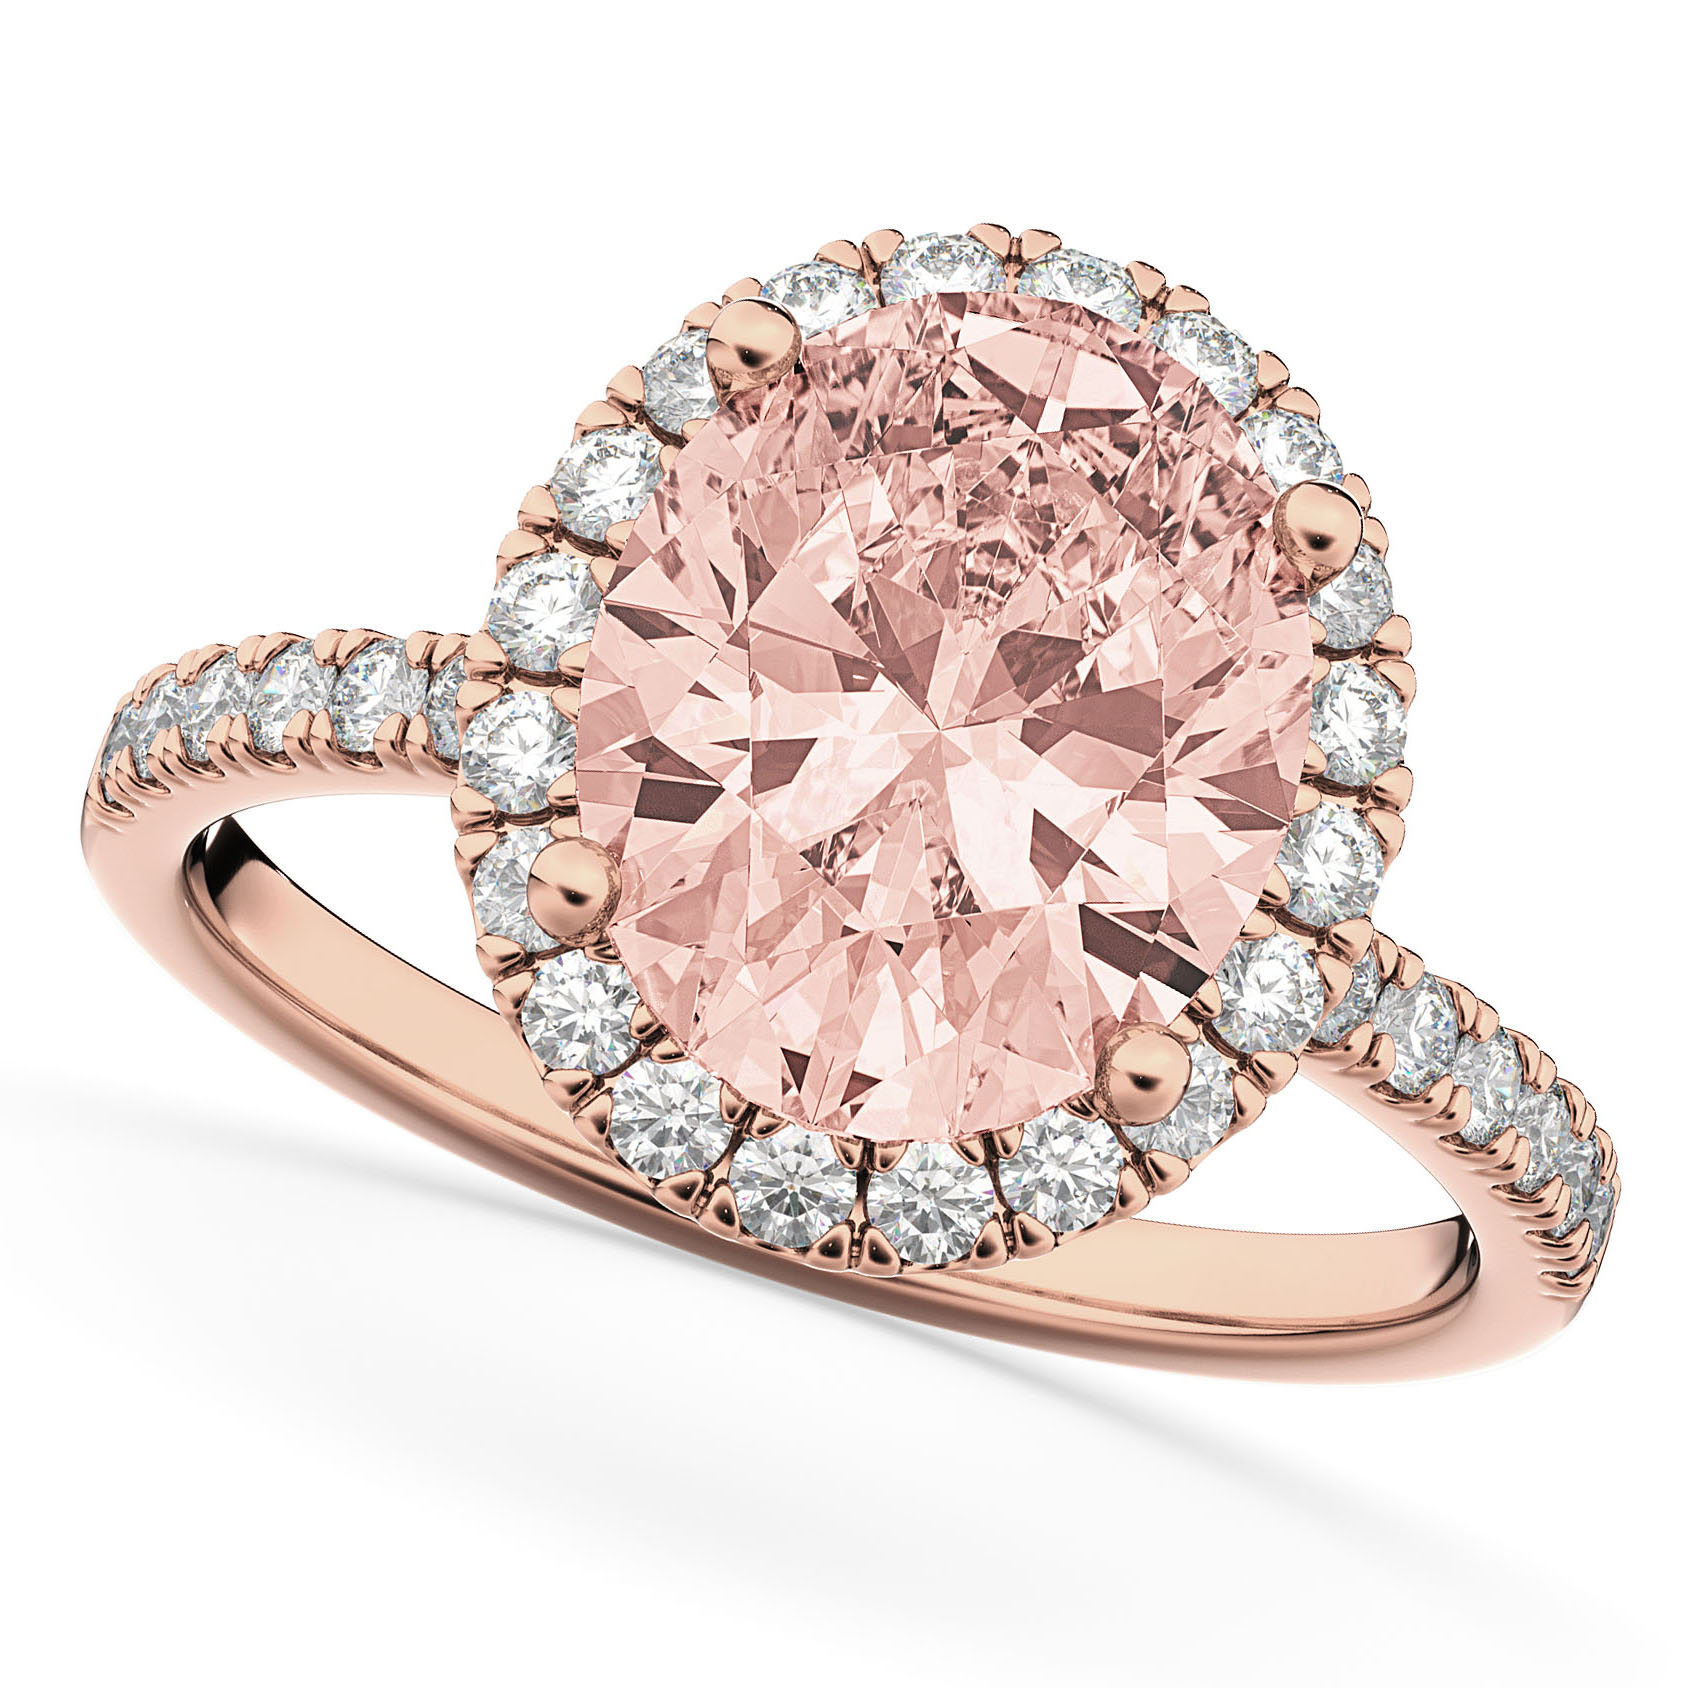 Oval Cut Halo Morganite & Diamond Engagement Ring 14K Rose Gold 2.81 ...